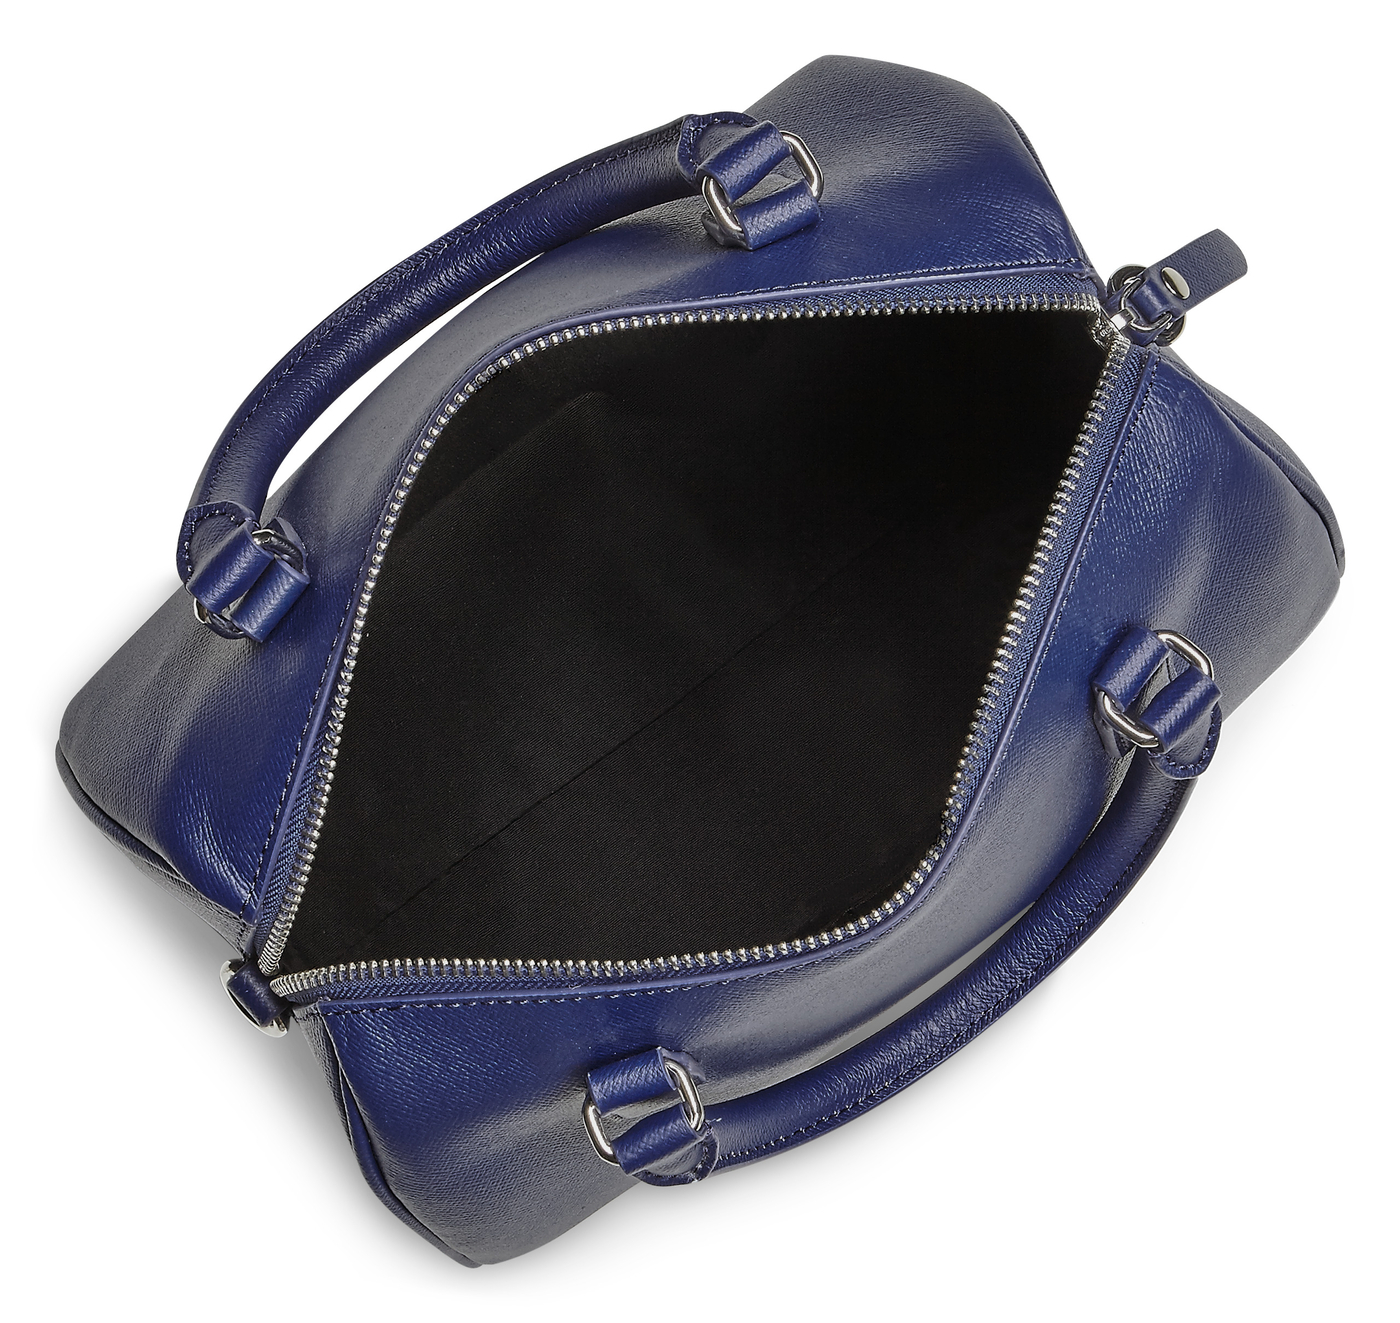 ECCO Iola Bowling Bag